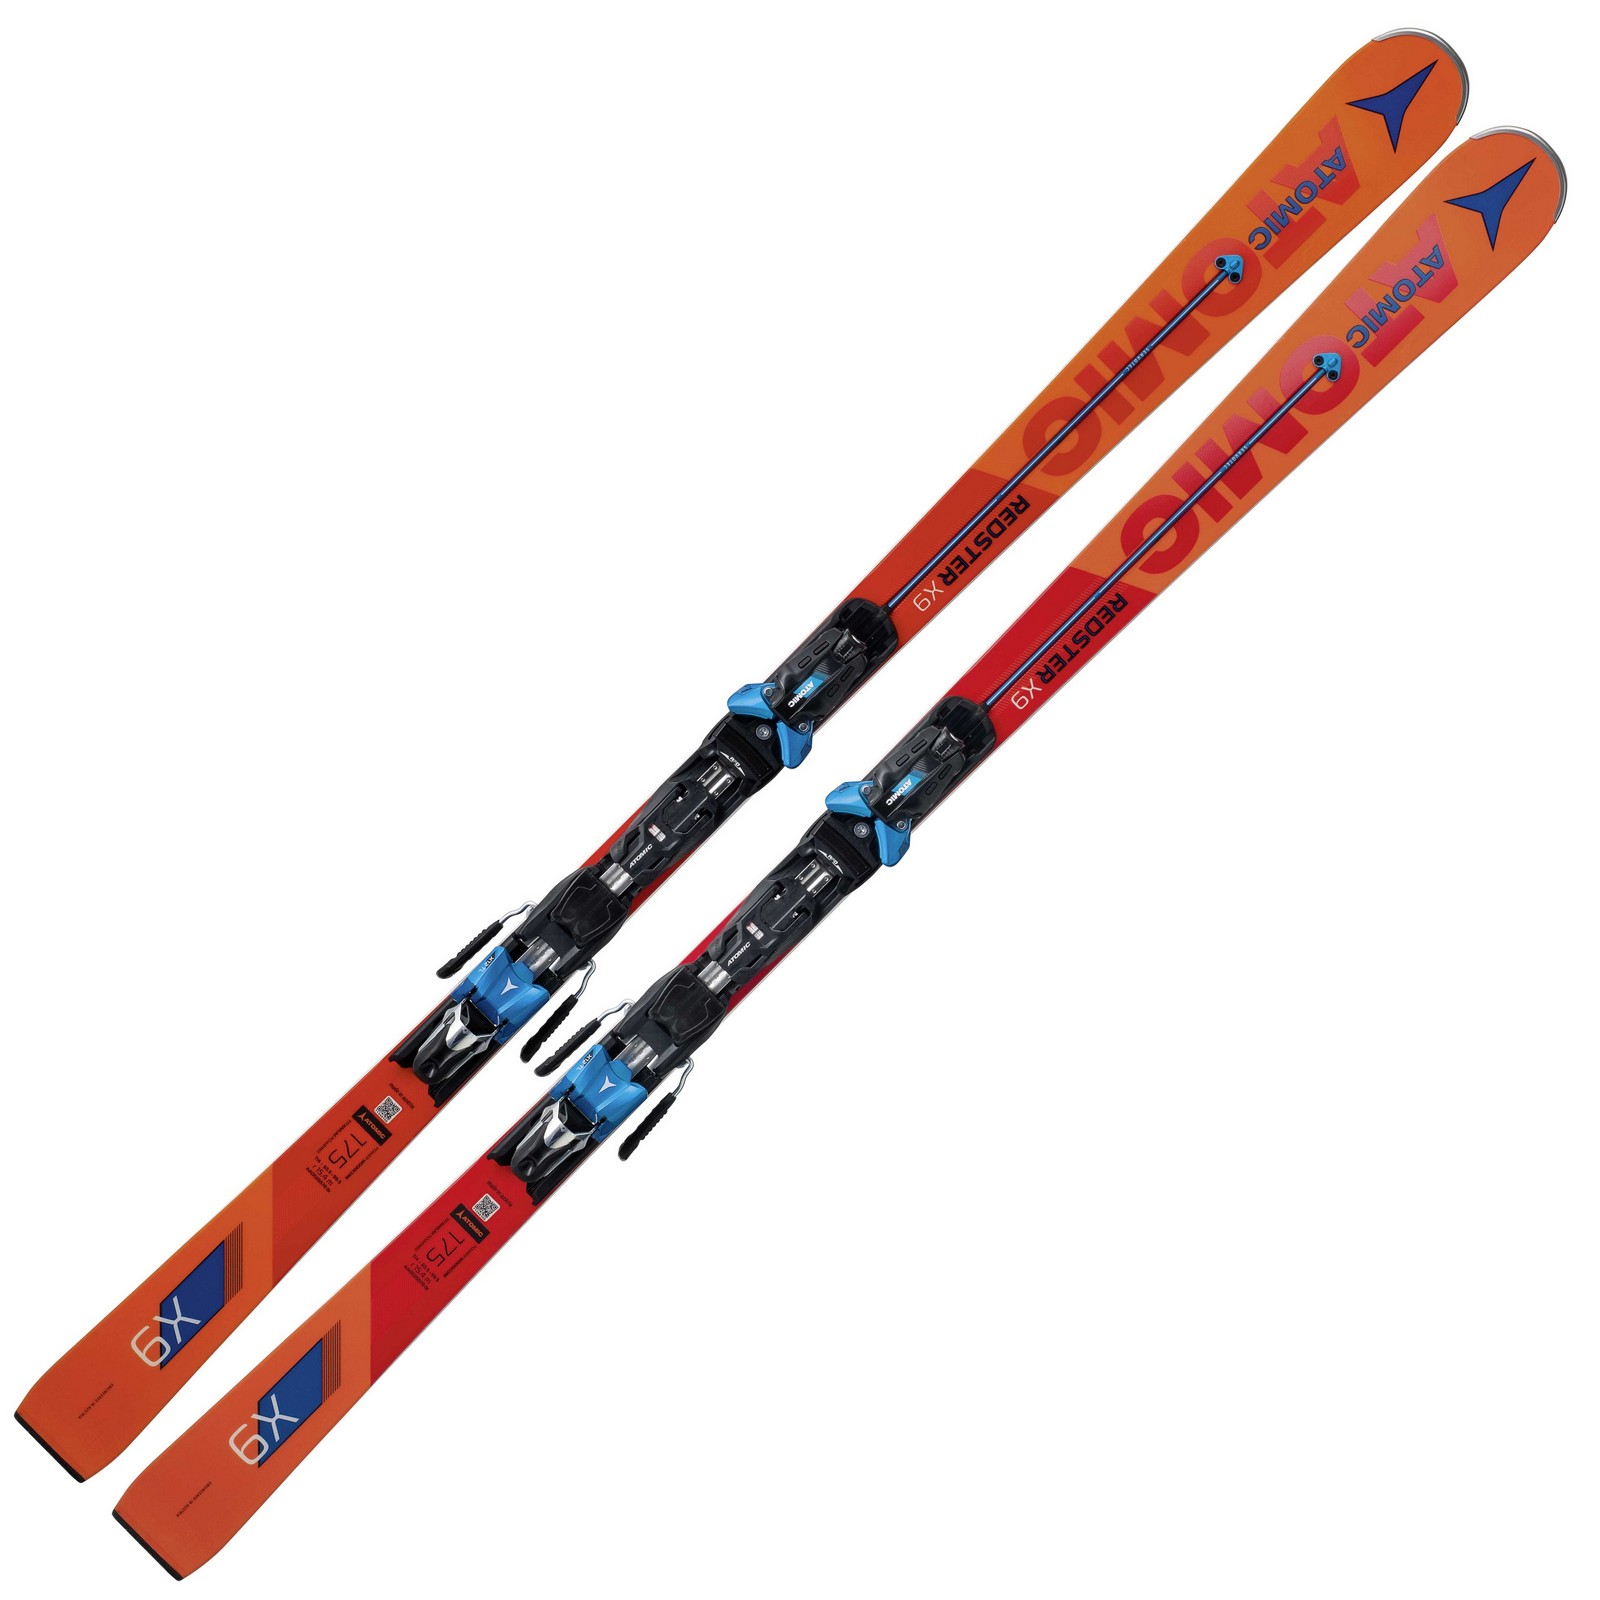 Atomic Redster X9 Frontside Ski + X 12 TL OME Binding